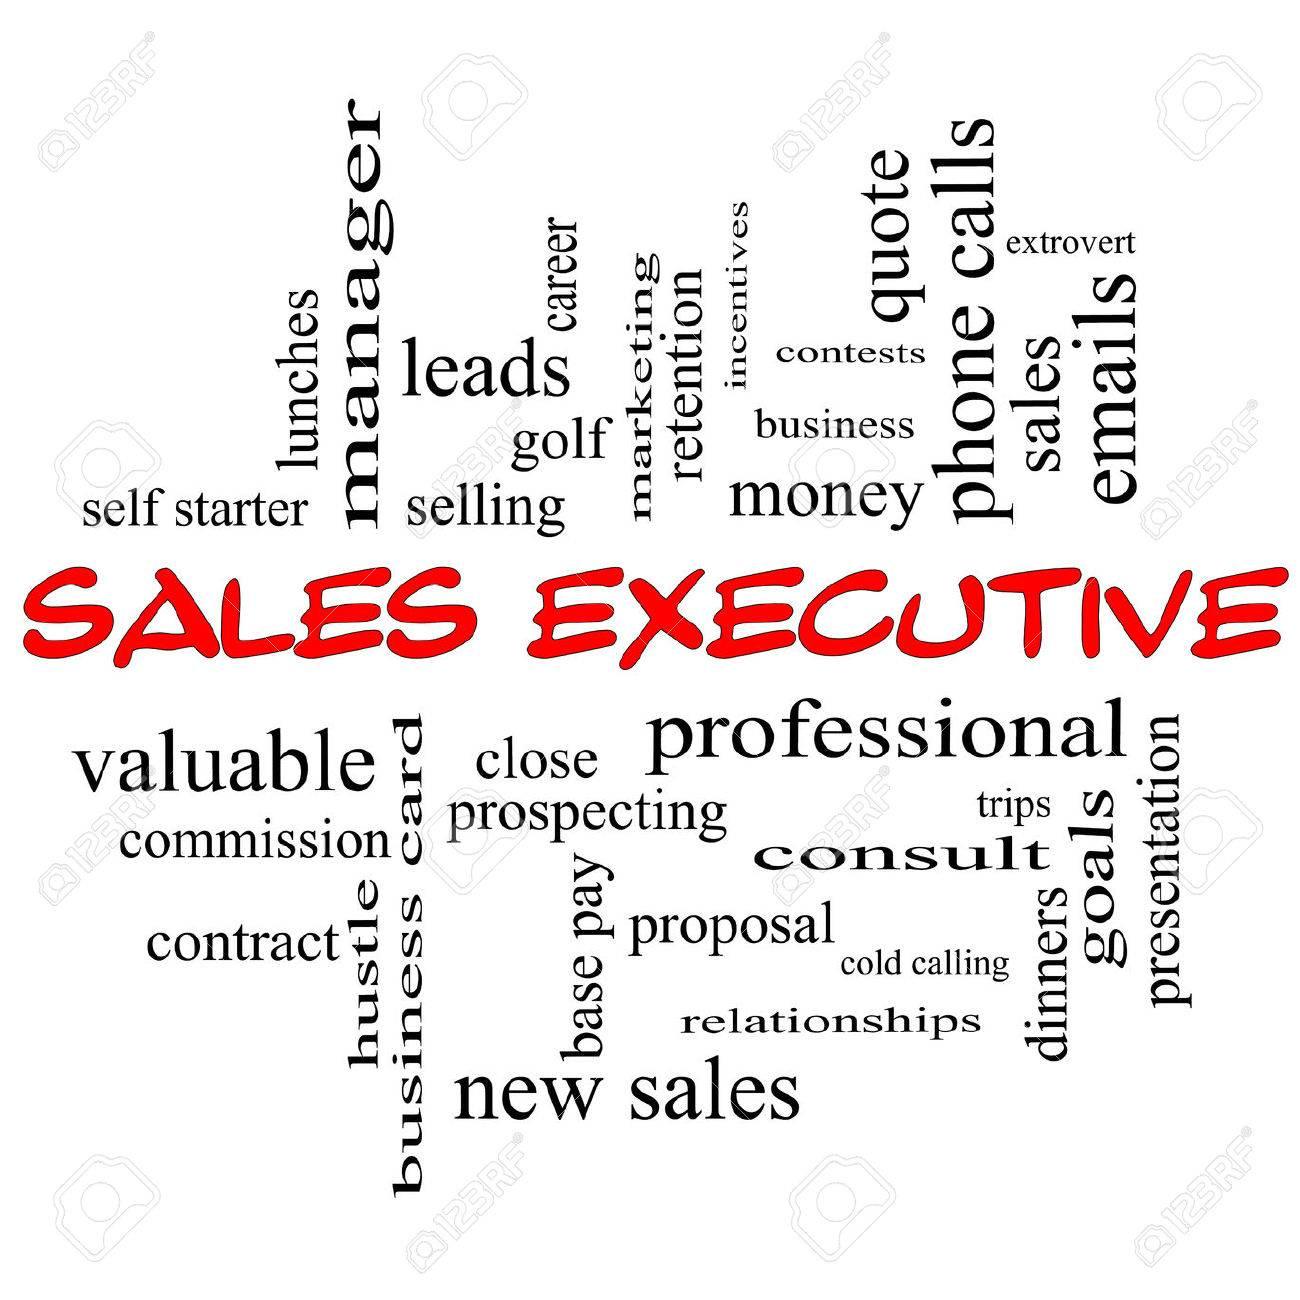 Sales Executive Word Wolke Konzept In Roten Kappen Mit Großer